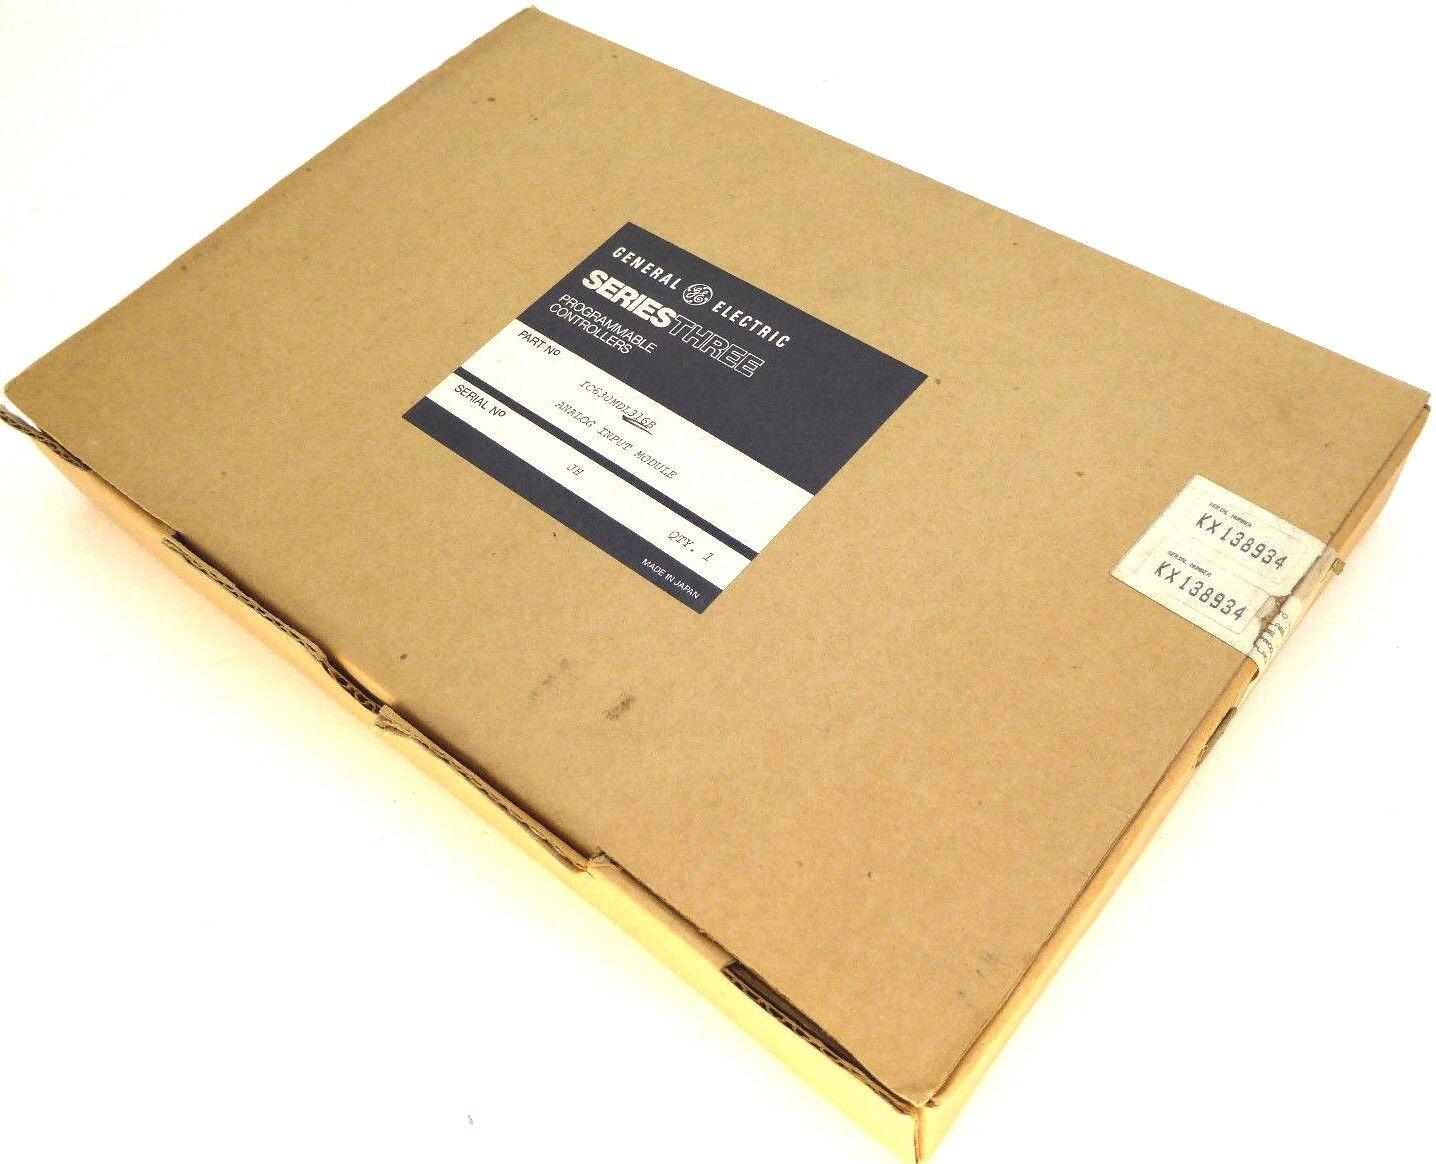 GE Fanuc  IC630MDL316B   Series Three  Analog Input Module  NEW IN BOX